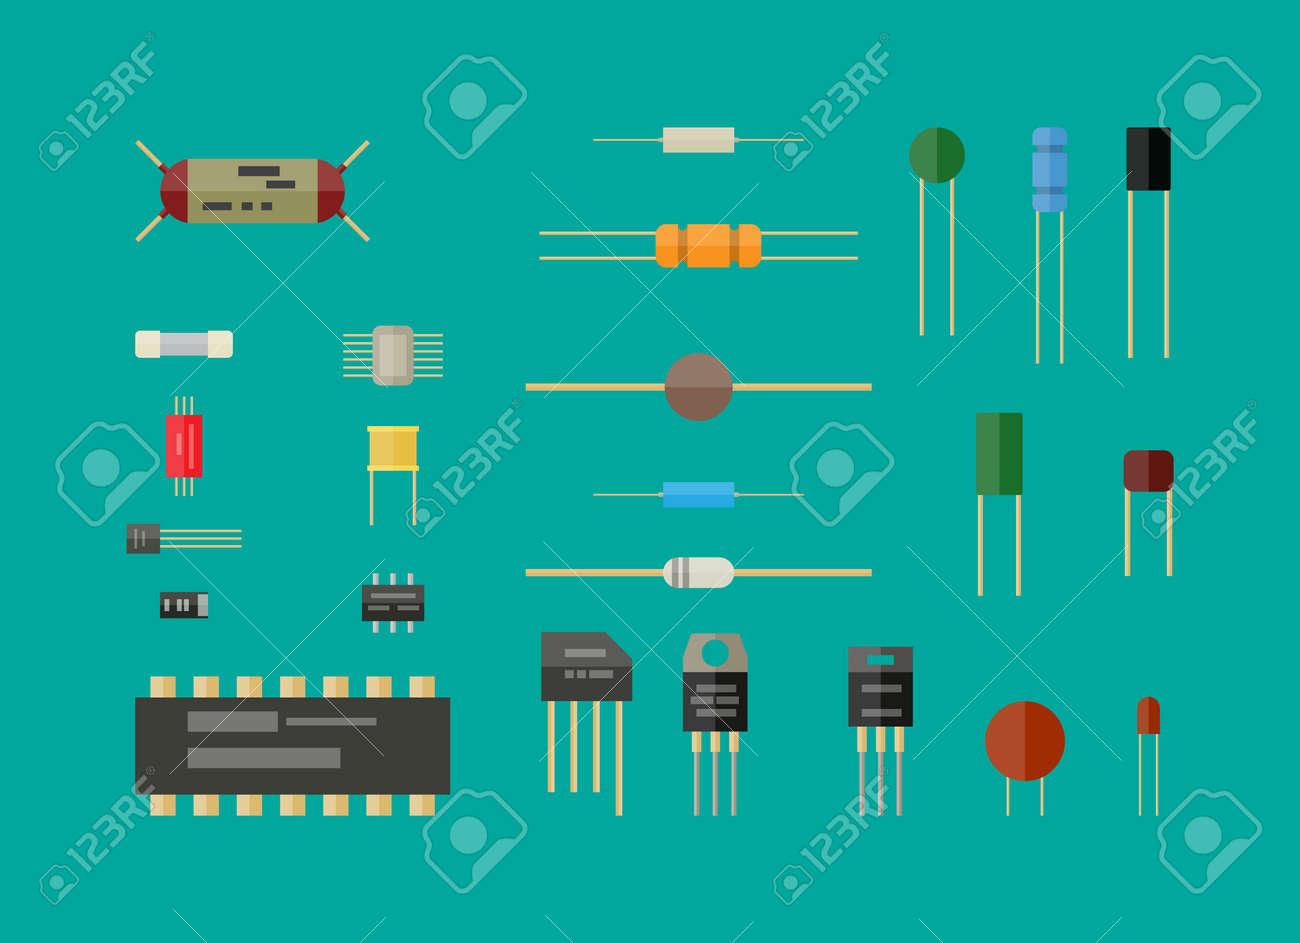 Resistance Capacitor And Transistor Circuits Modern Design Of Control Electronic Potentiometer Circuit Basiccircuit Components Set Resistor Rh 123rf Com Resistors